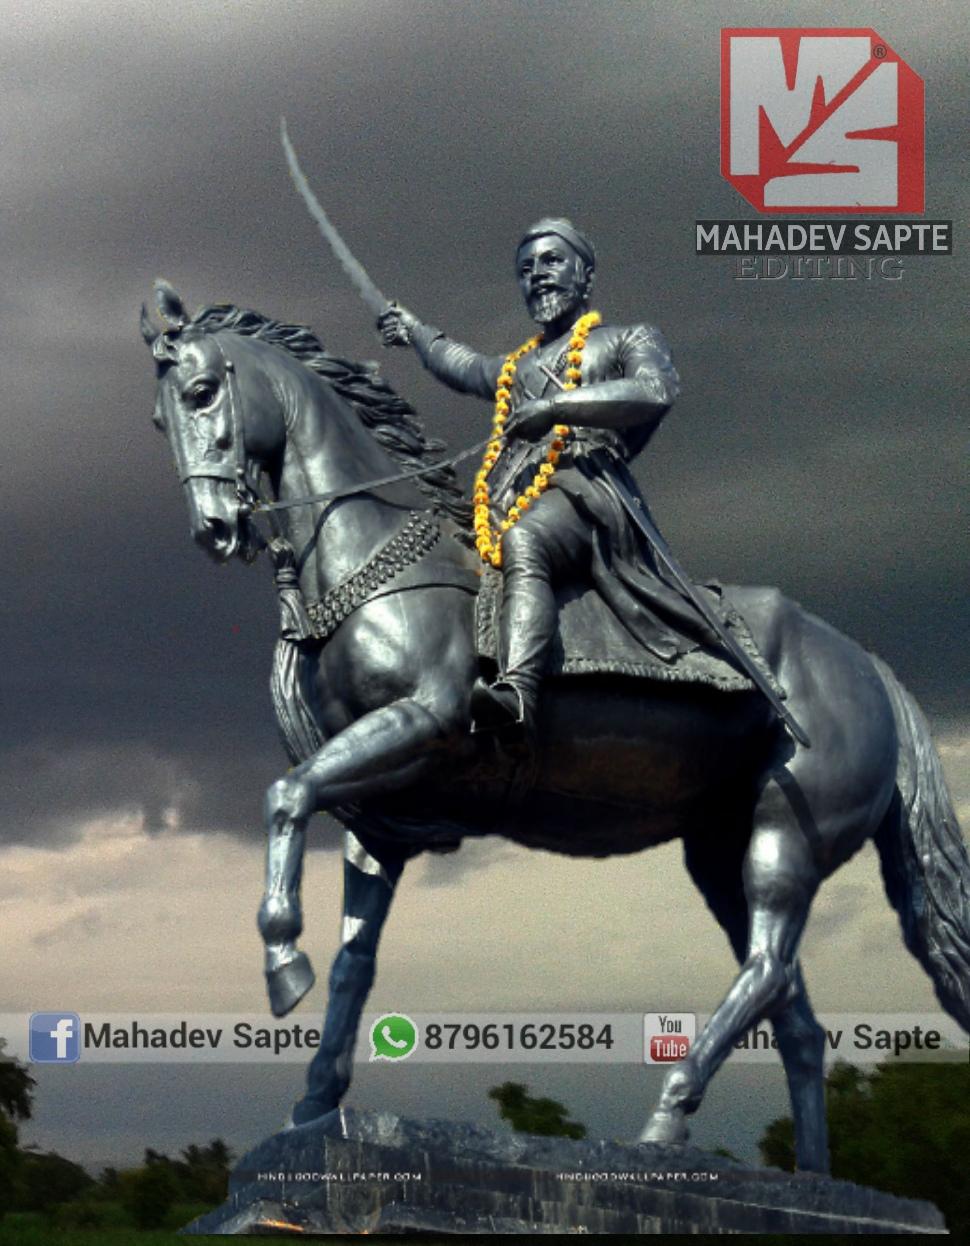 Hd wallpaper shivaji maharaj - Shivaji Maharaj New Hd Photos